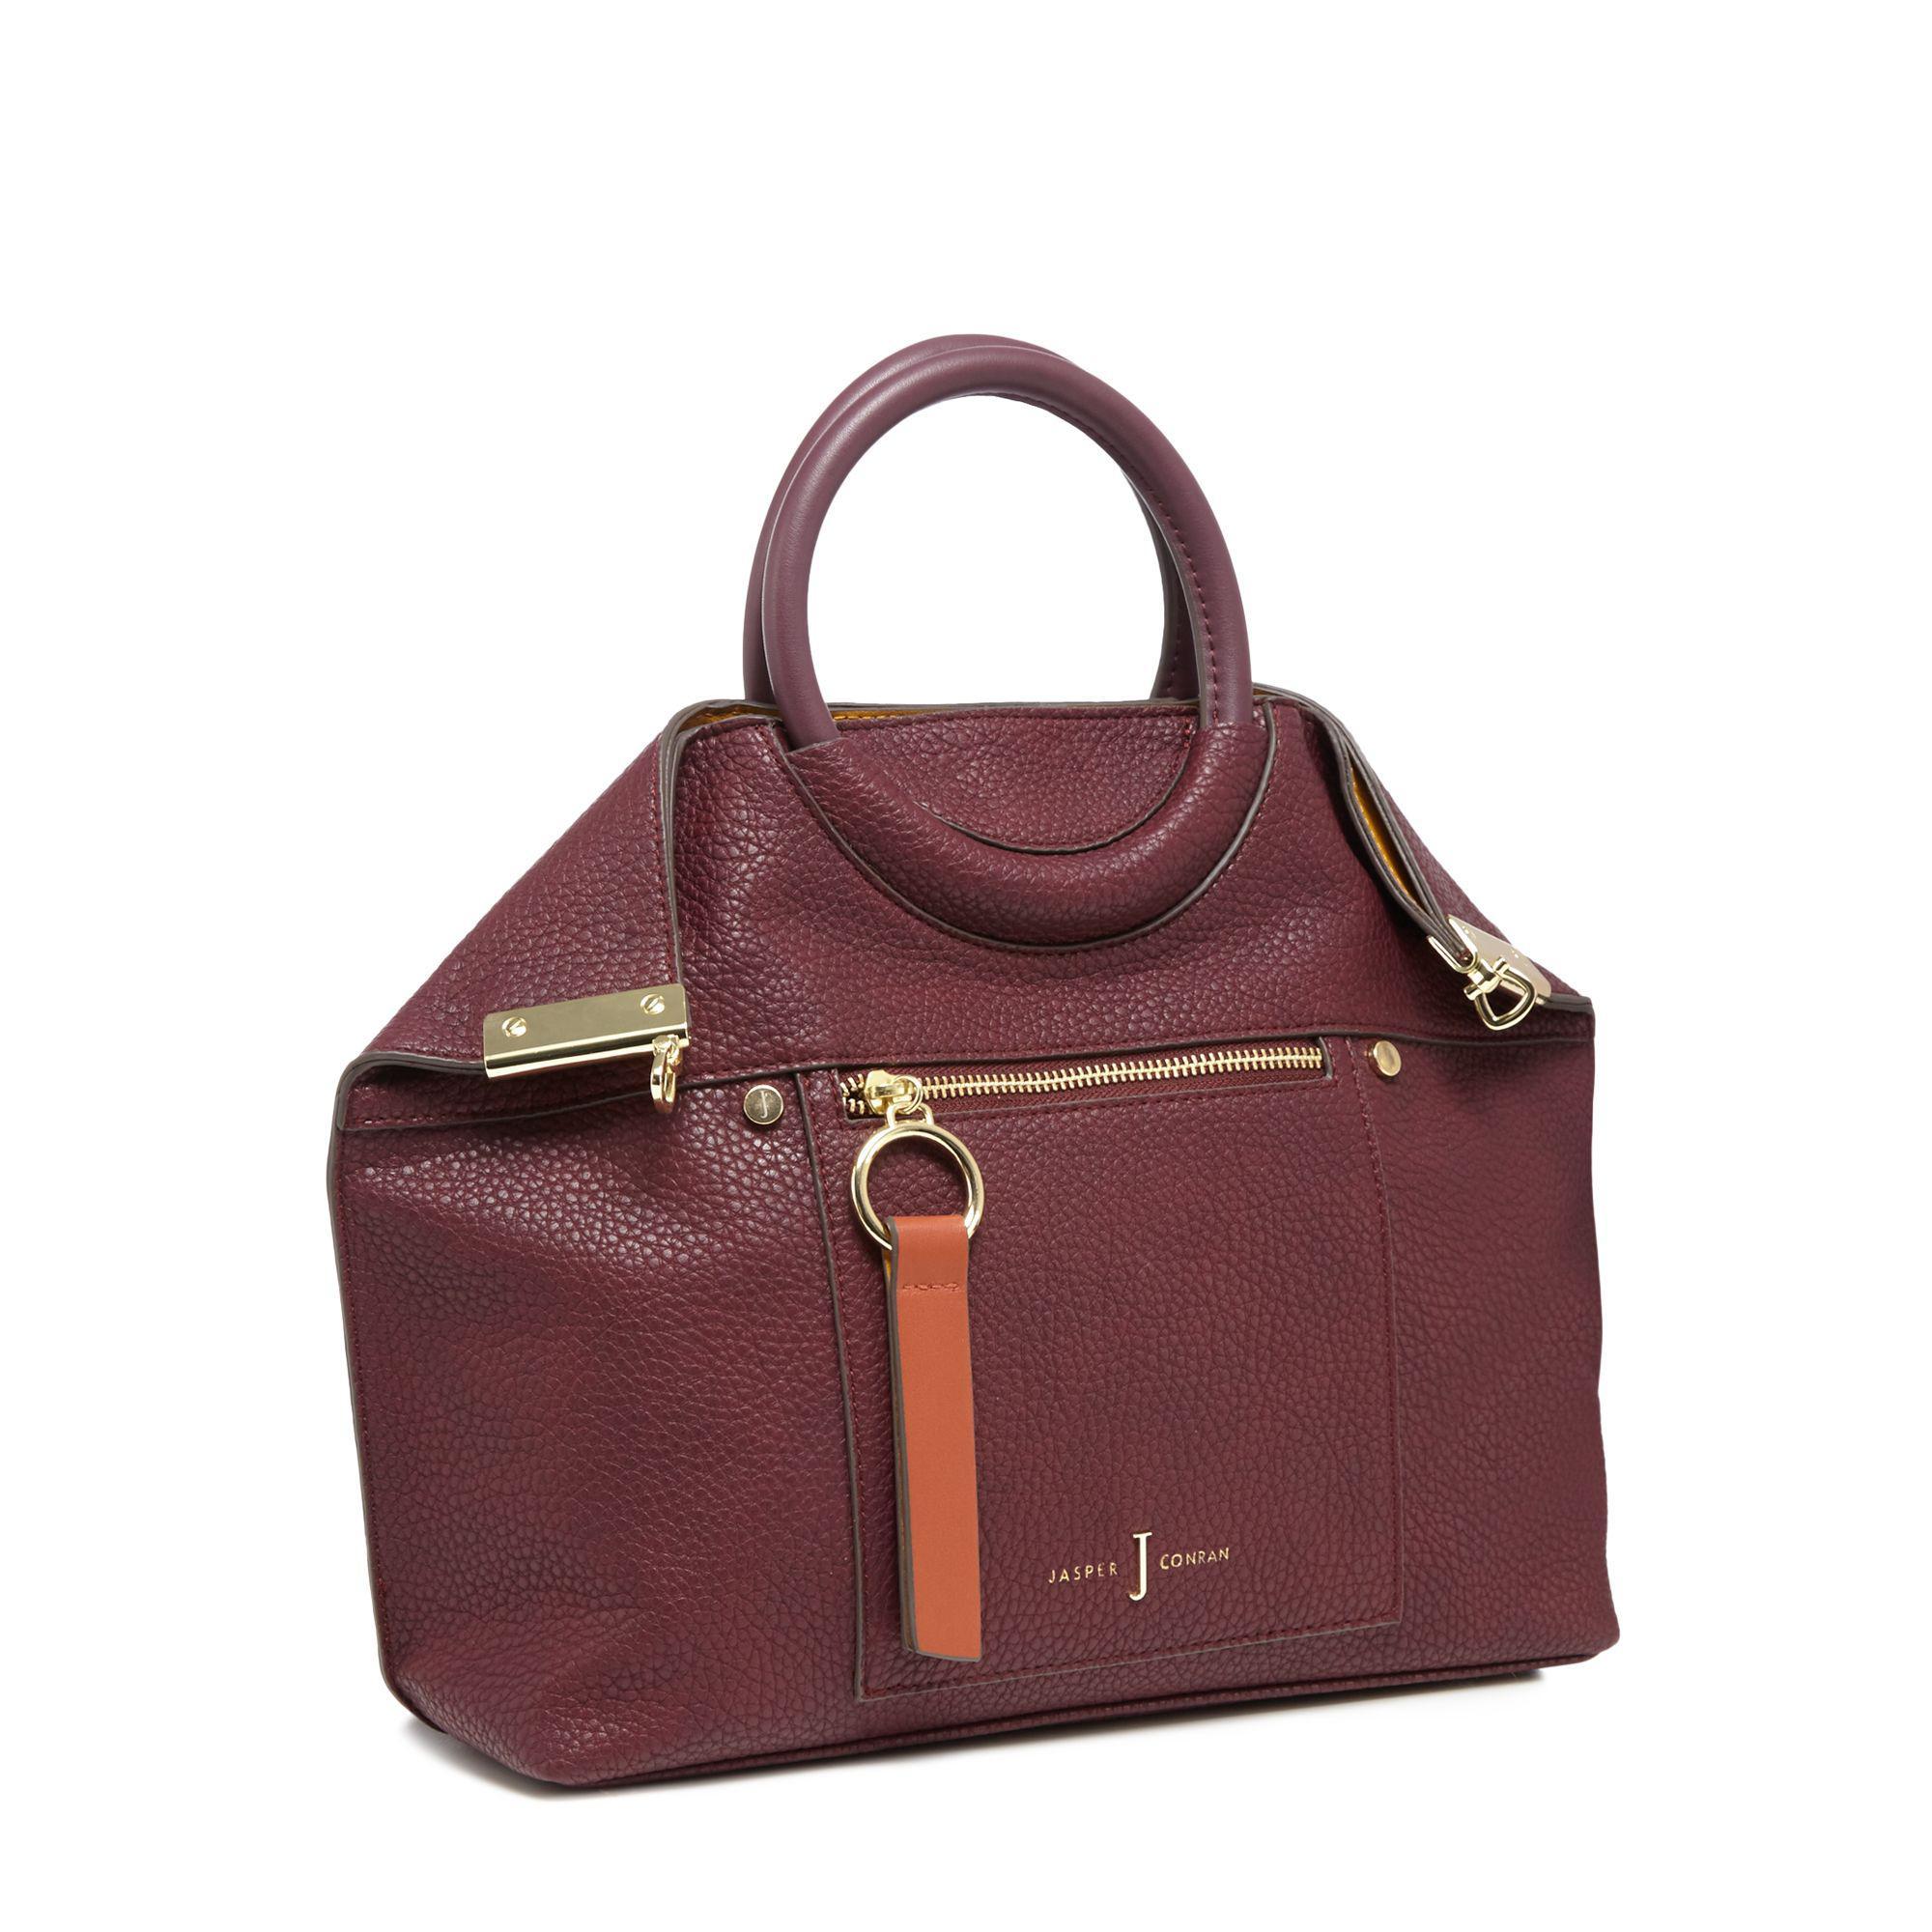 J By Jasper Conran Wine Red Ring Handle Tote Bag